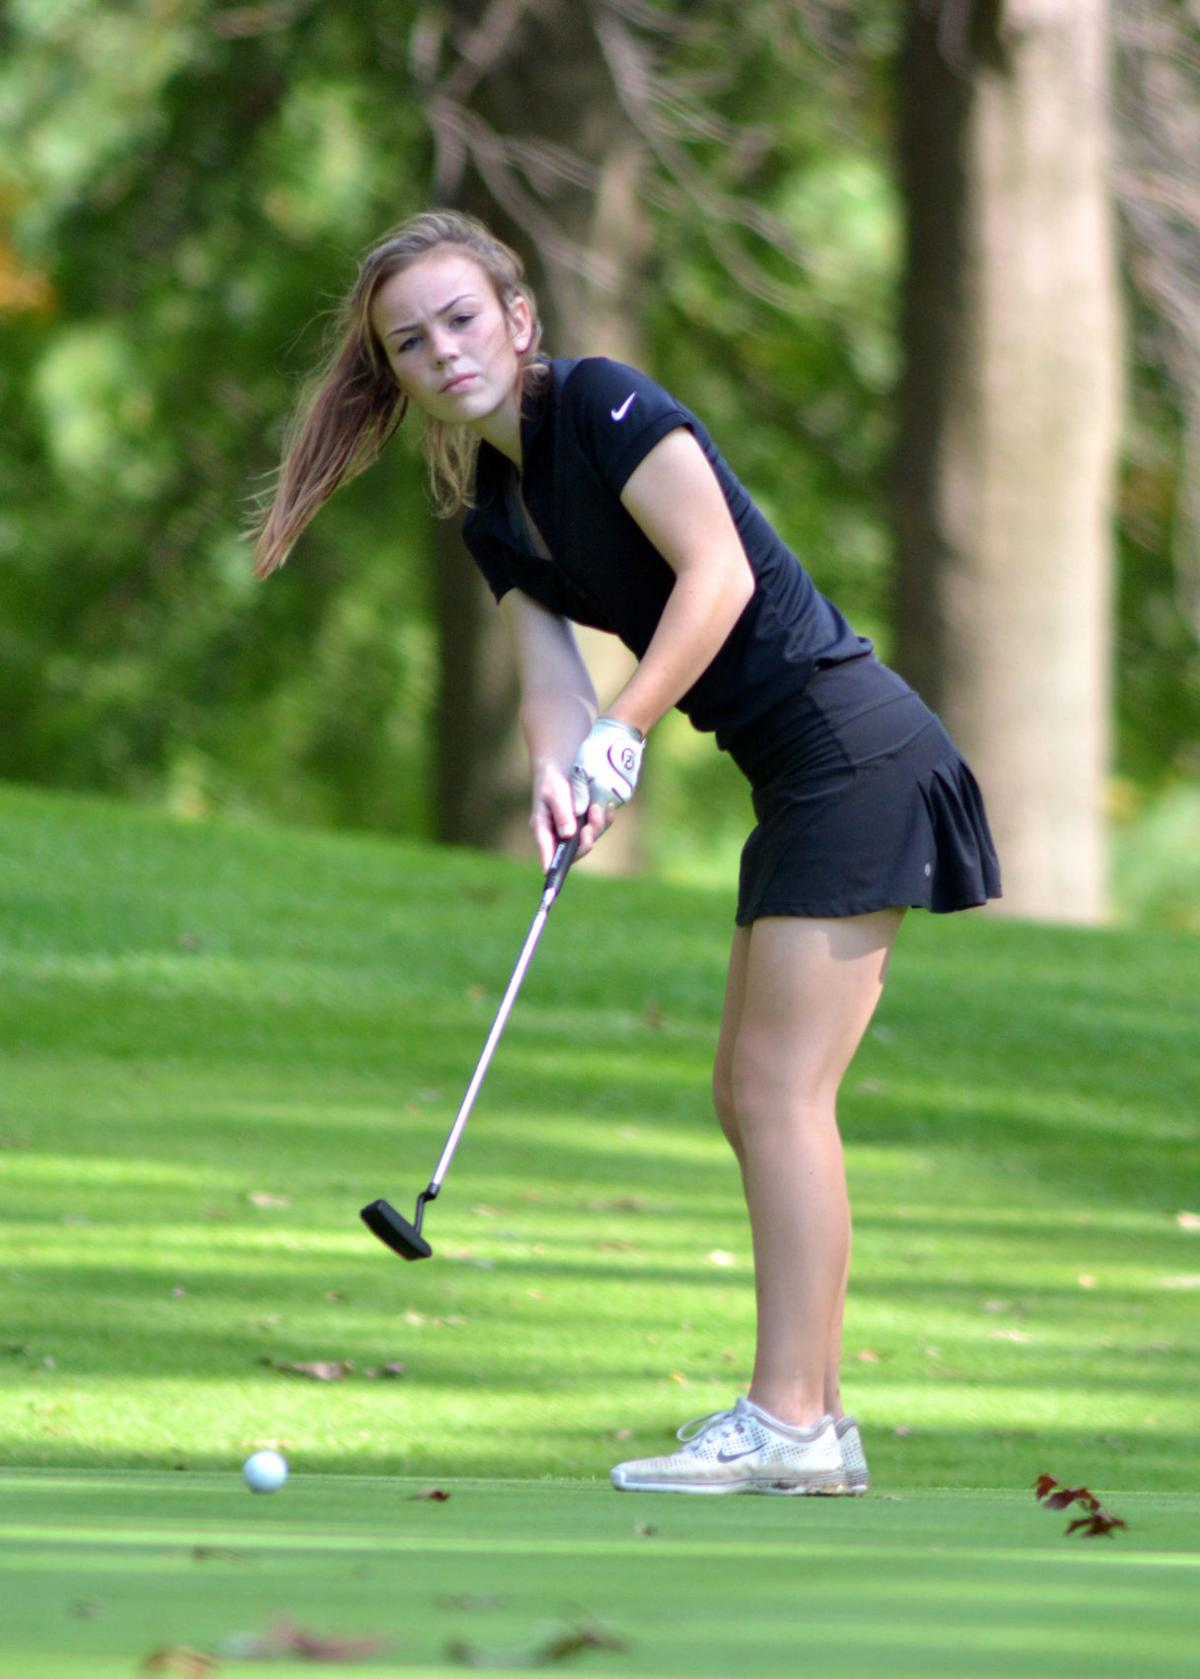 GIRLS GOLF: EHS girls golf ready for season - The Edwardsville Intelligencer